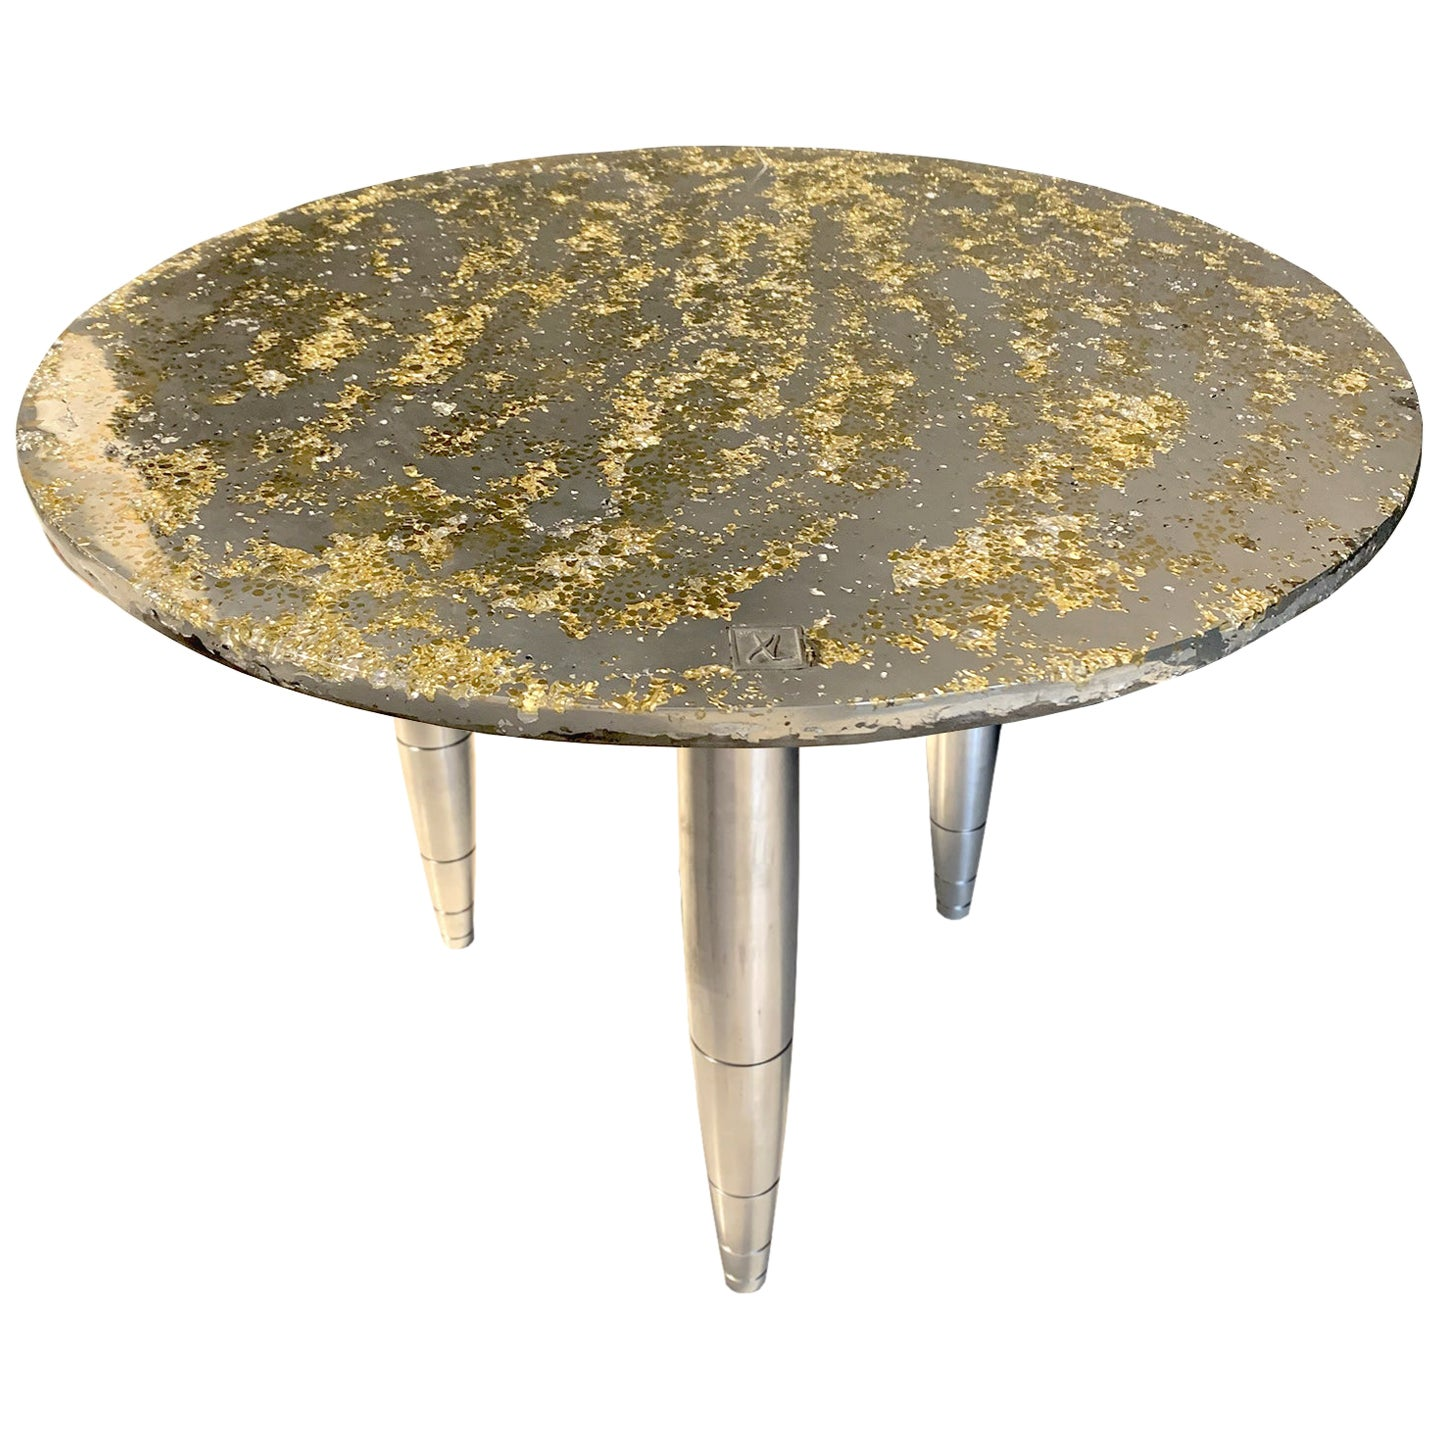 "Side Table Star Dust ""Sun light"", Melted Pewter, Brass Grains, Crystal Resin"